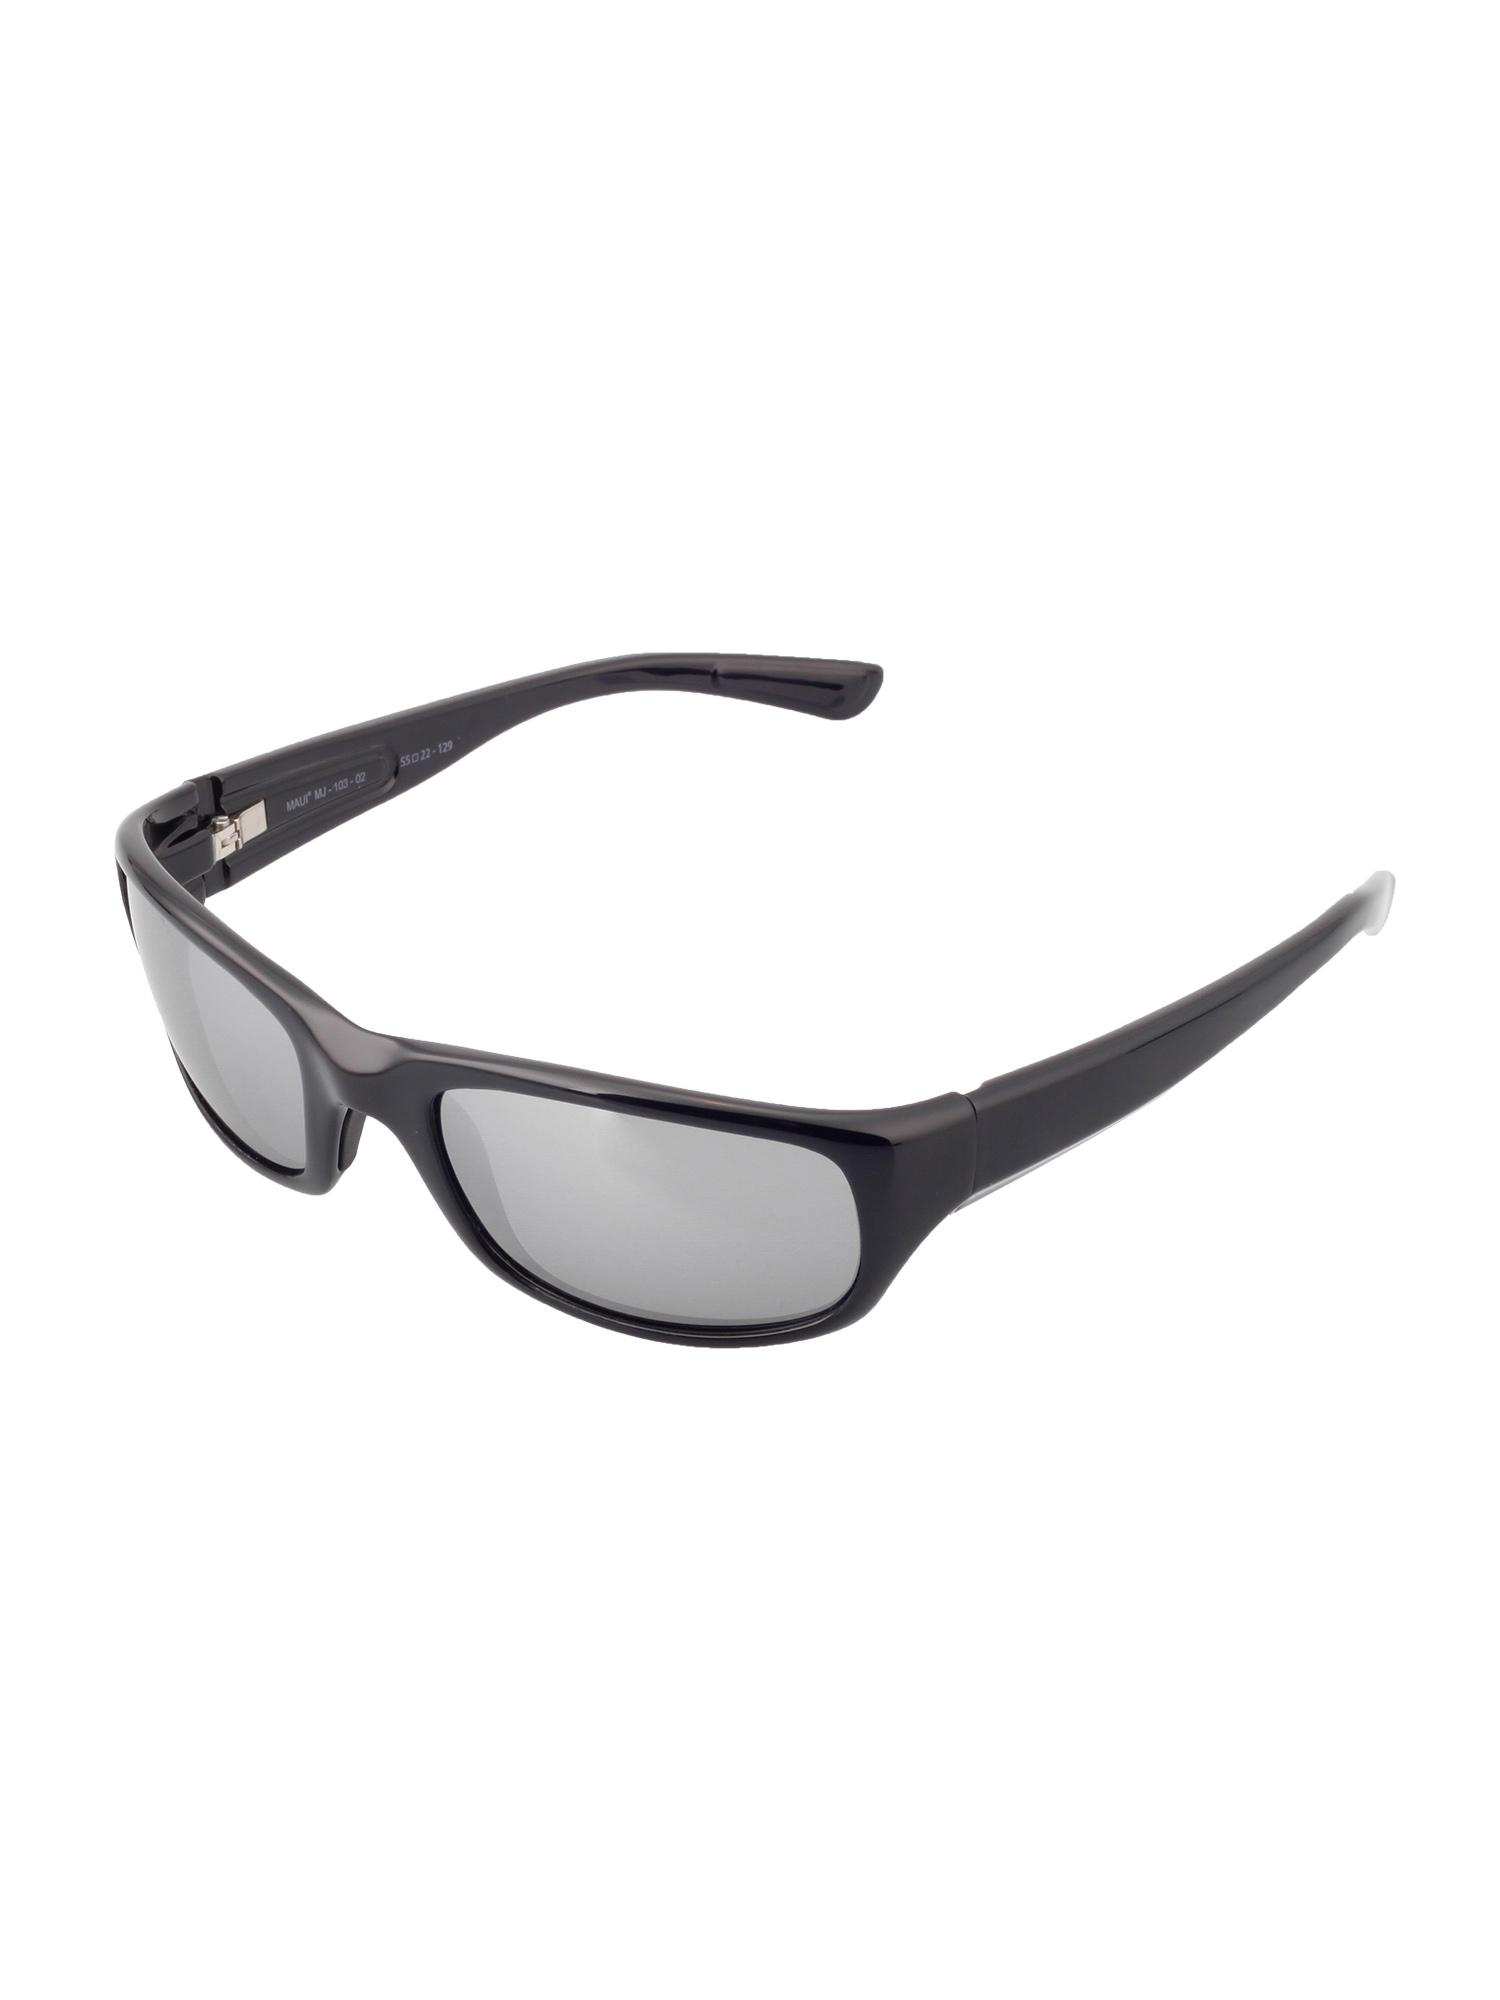 f1f9191c7e Walleva - Walleva Titanium Polarized Replacement Lenses for Maui Jim  Stingray Sunglasses - Walmart.com